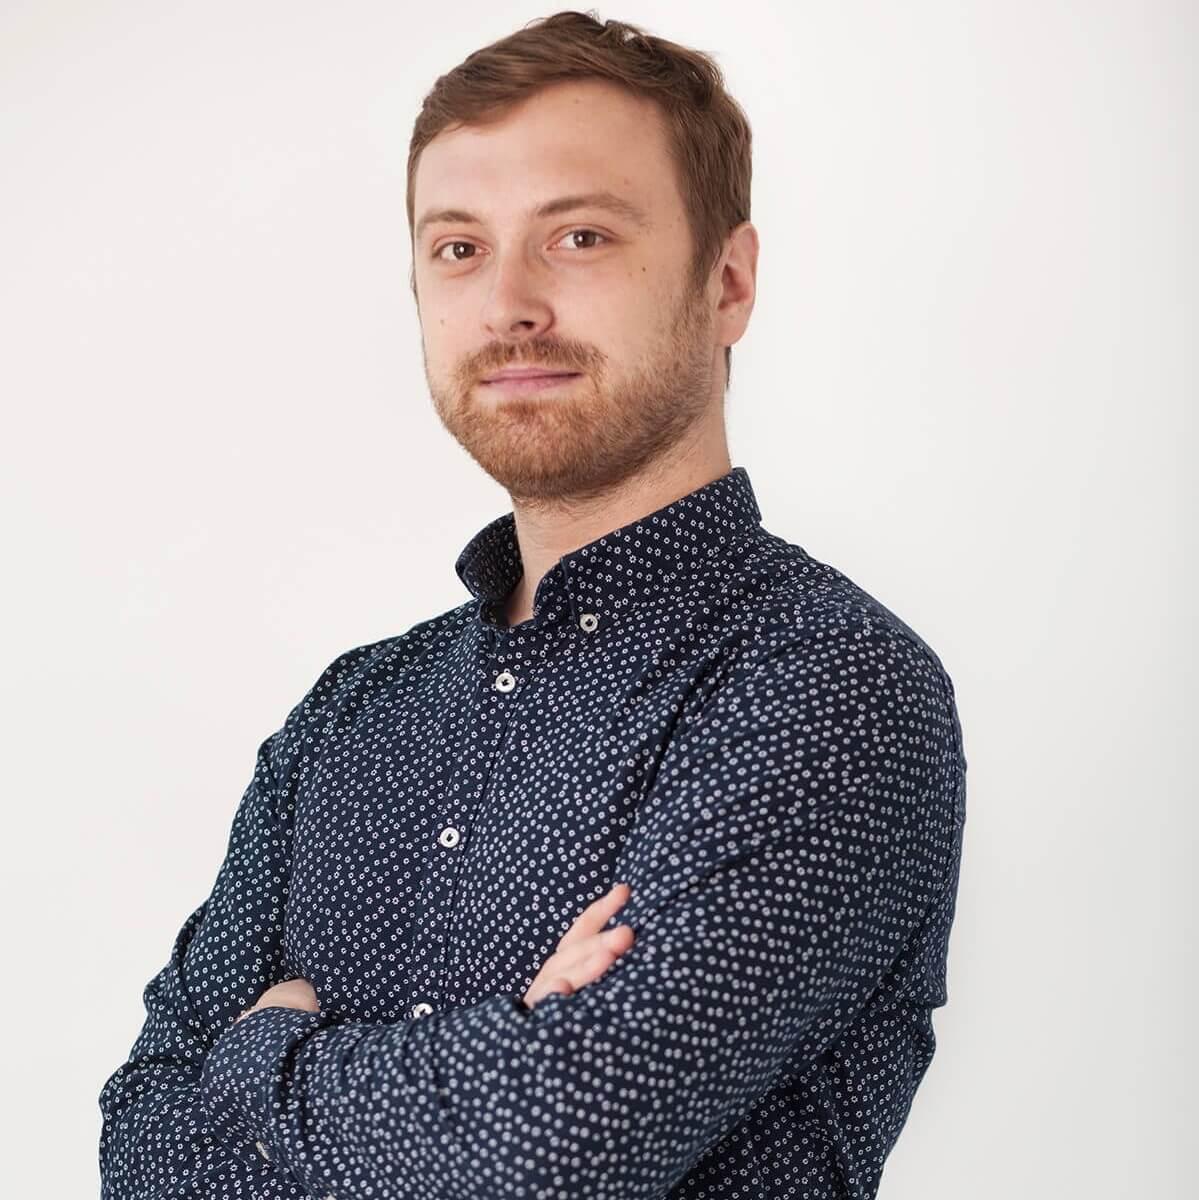 Mateusz Ossowski